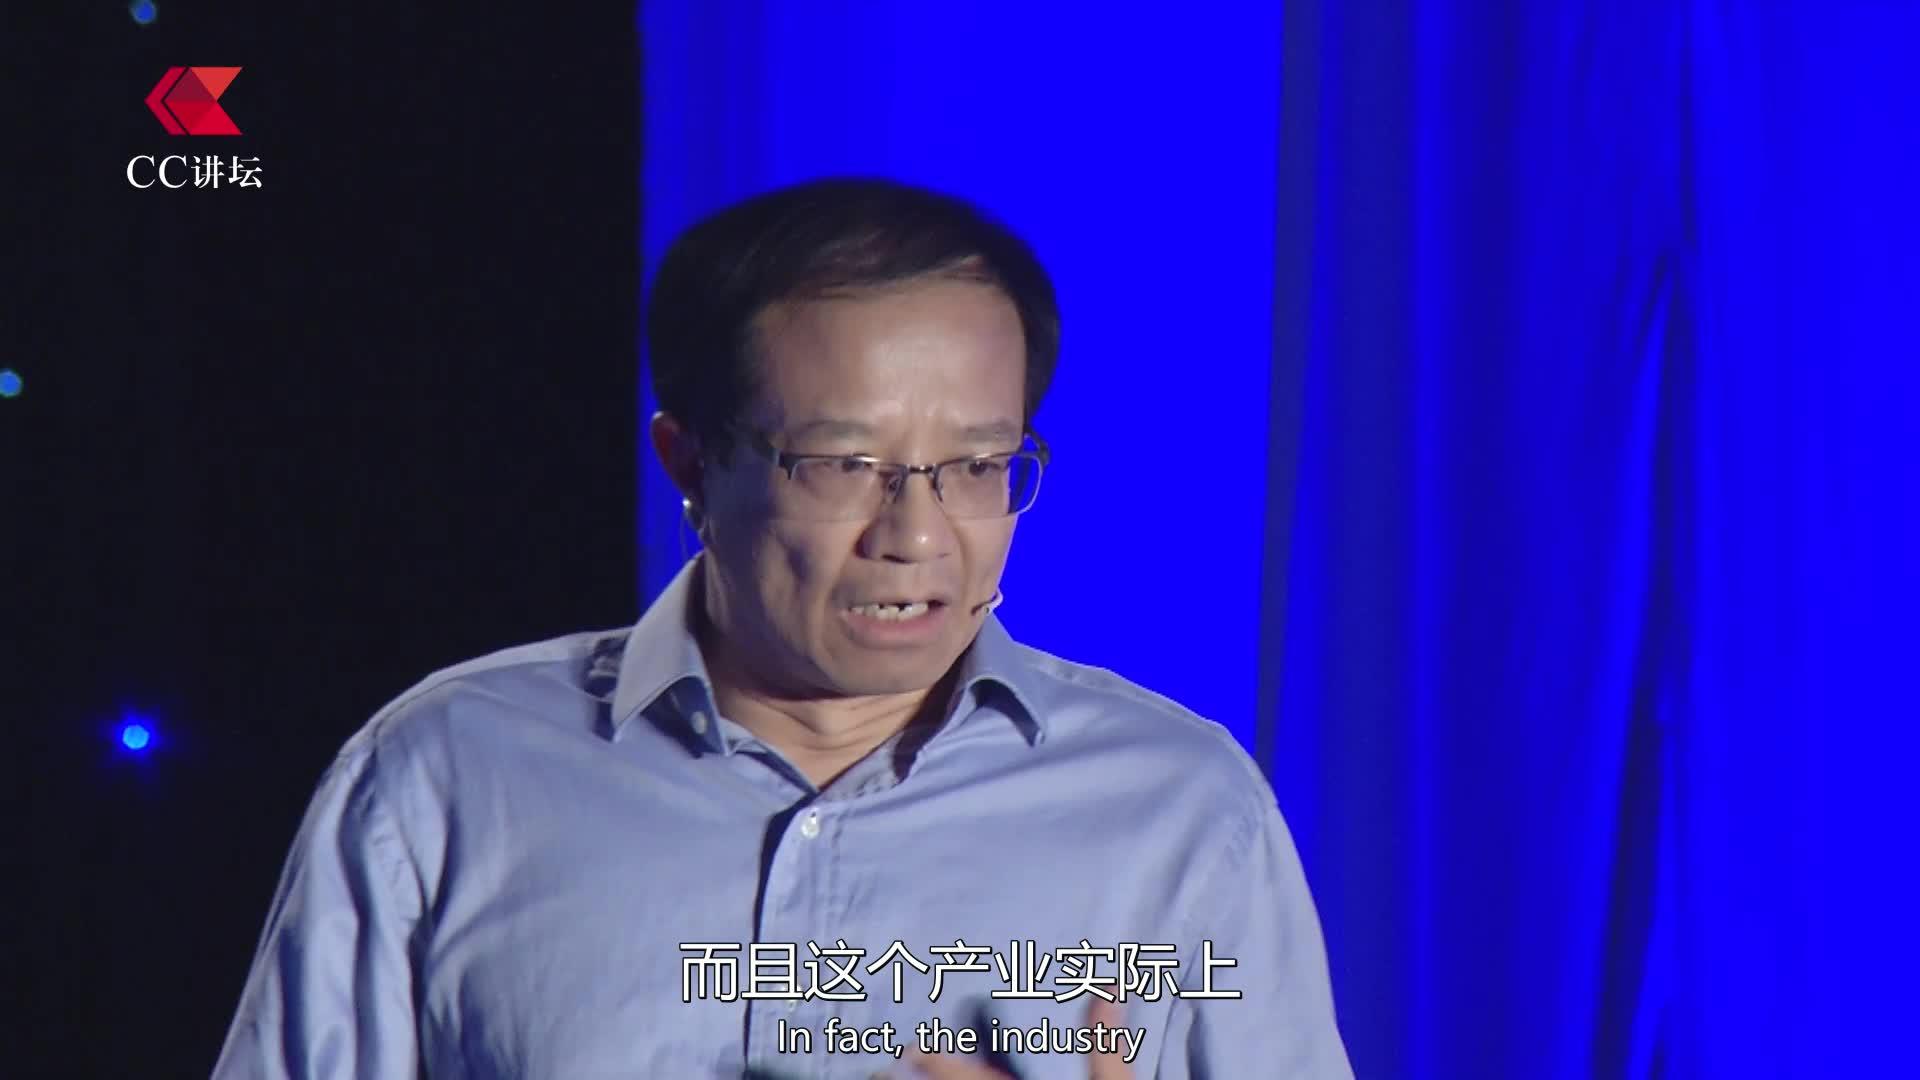 CC讲坛(科技):朱慧珑《集成电路,中国人可以》